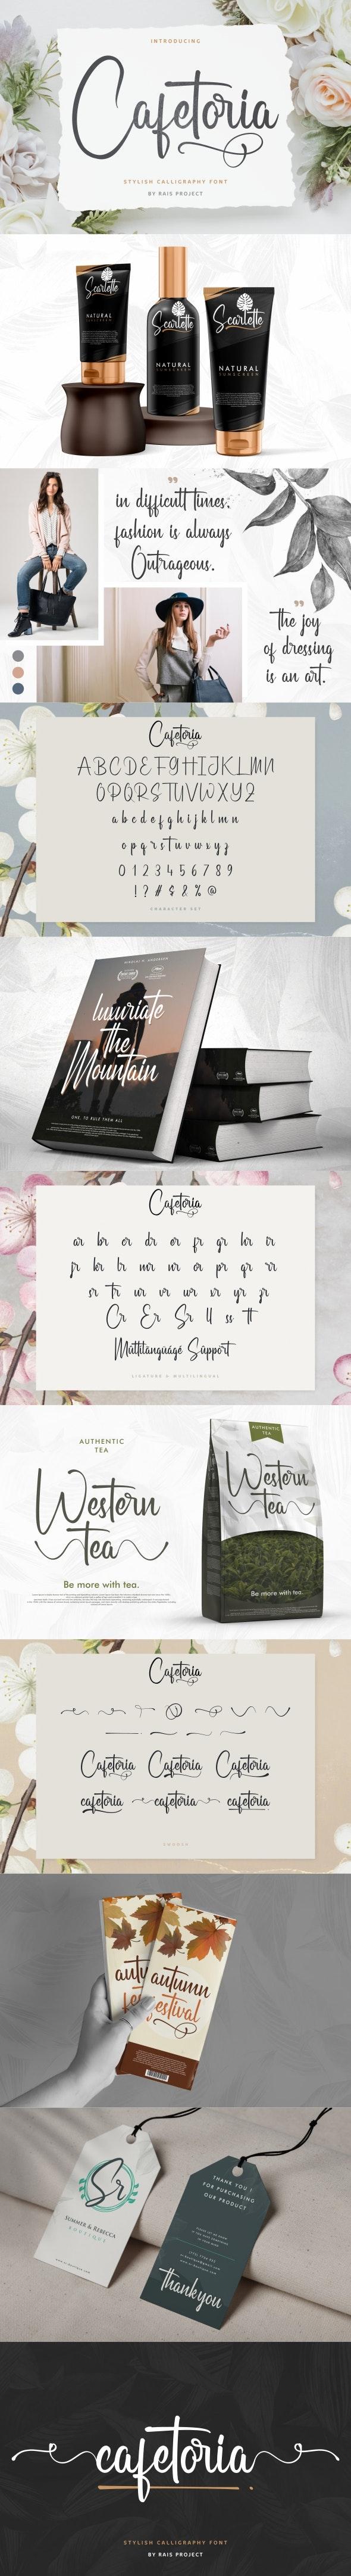 Cafetoria Calligraphy Font - Calligraphy Script